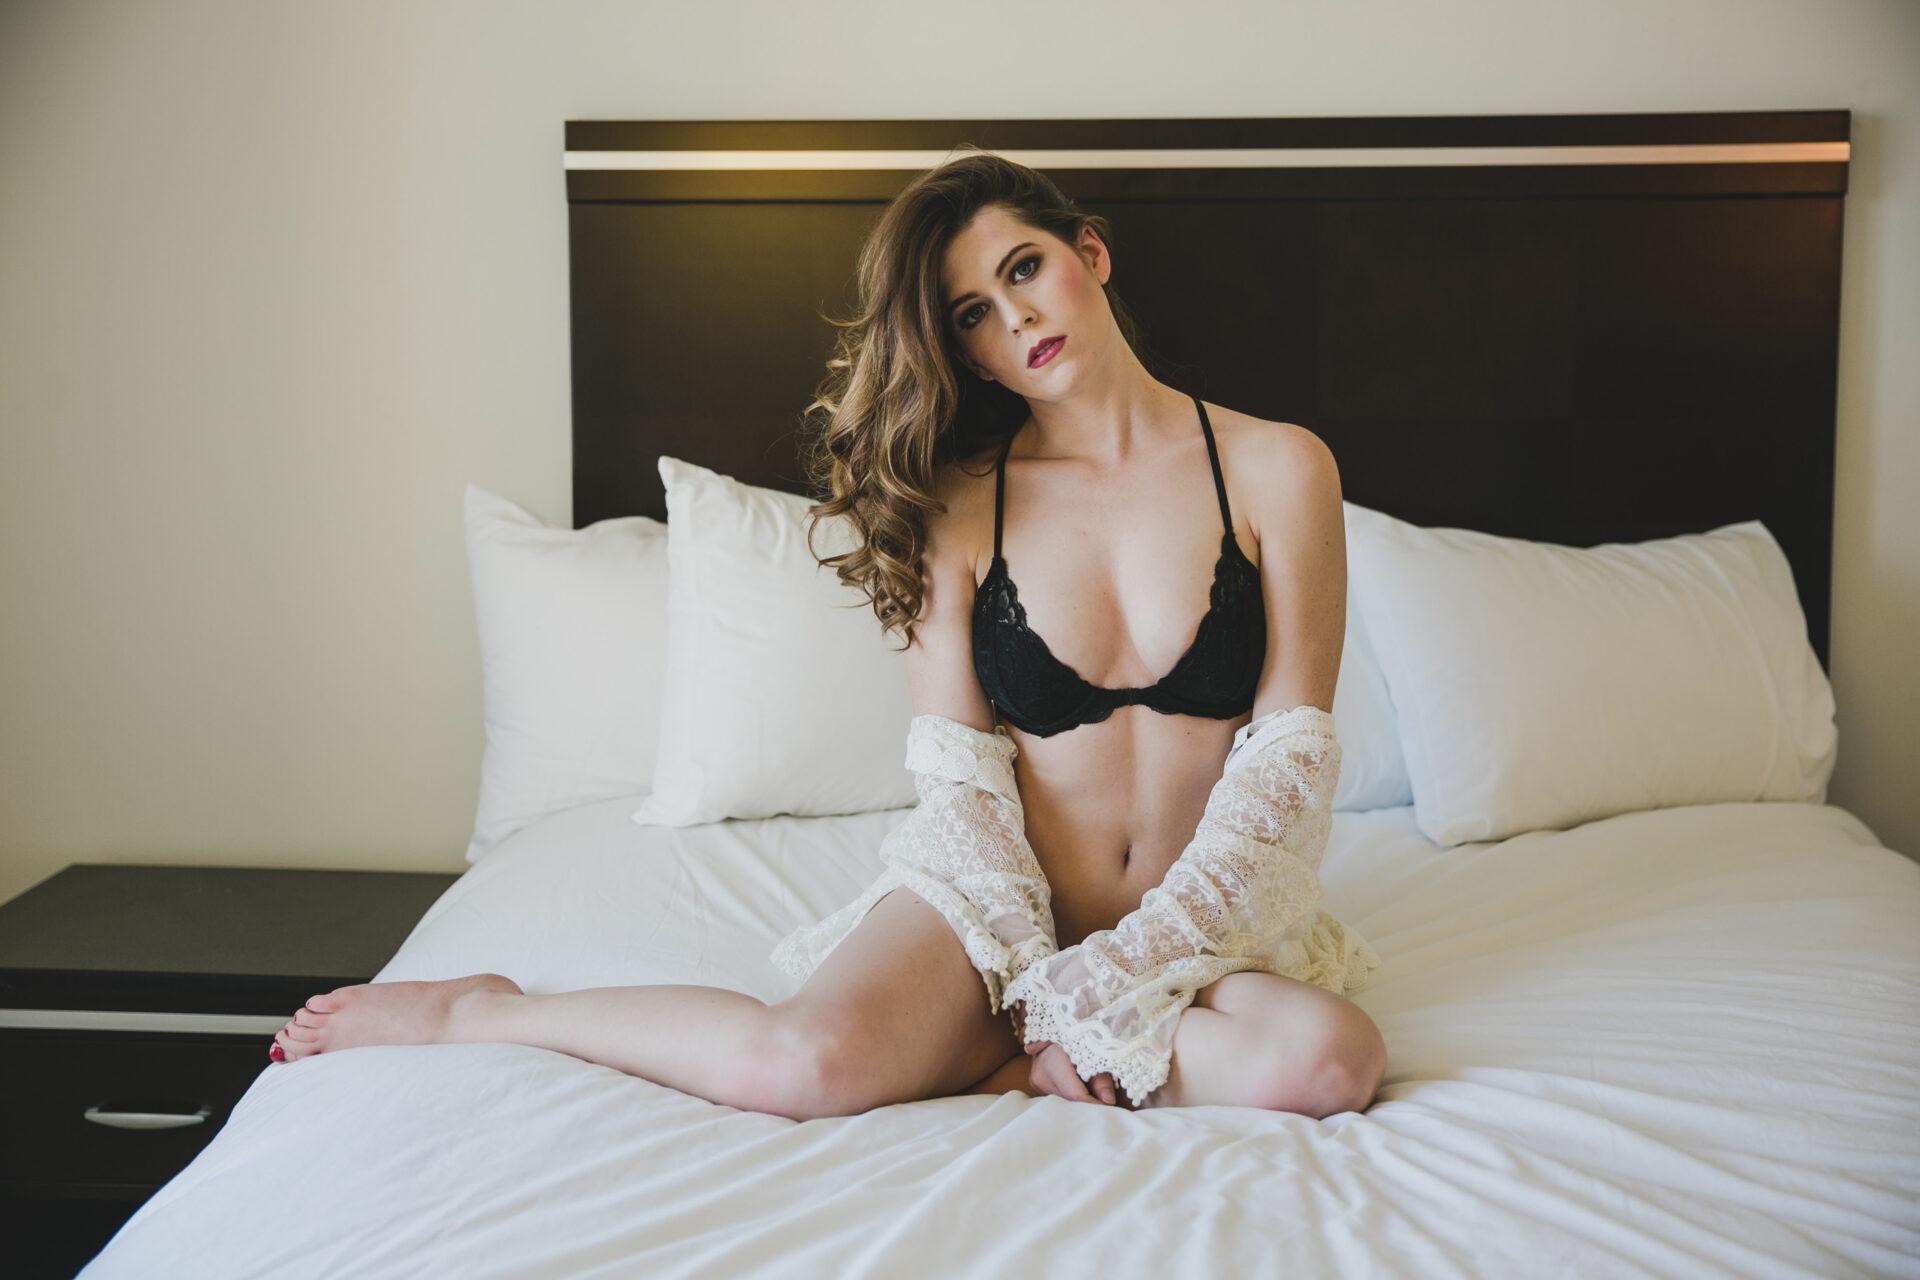 los-angeles-boudoir